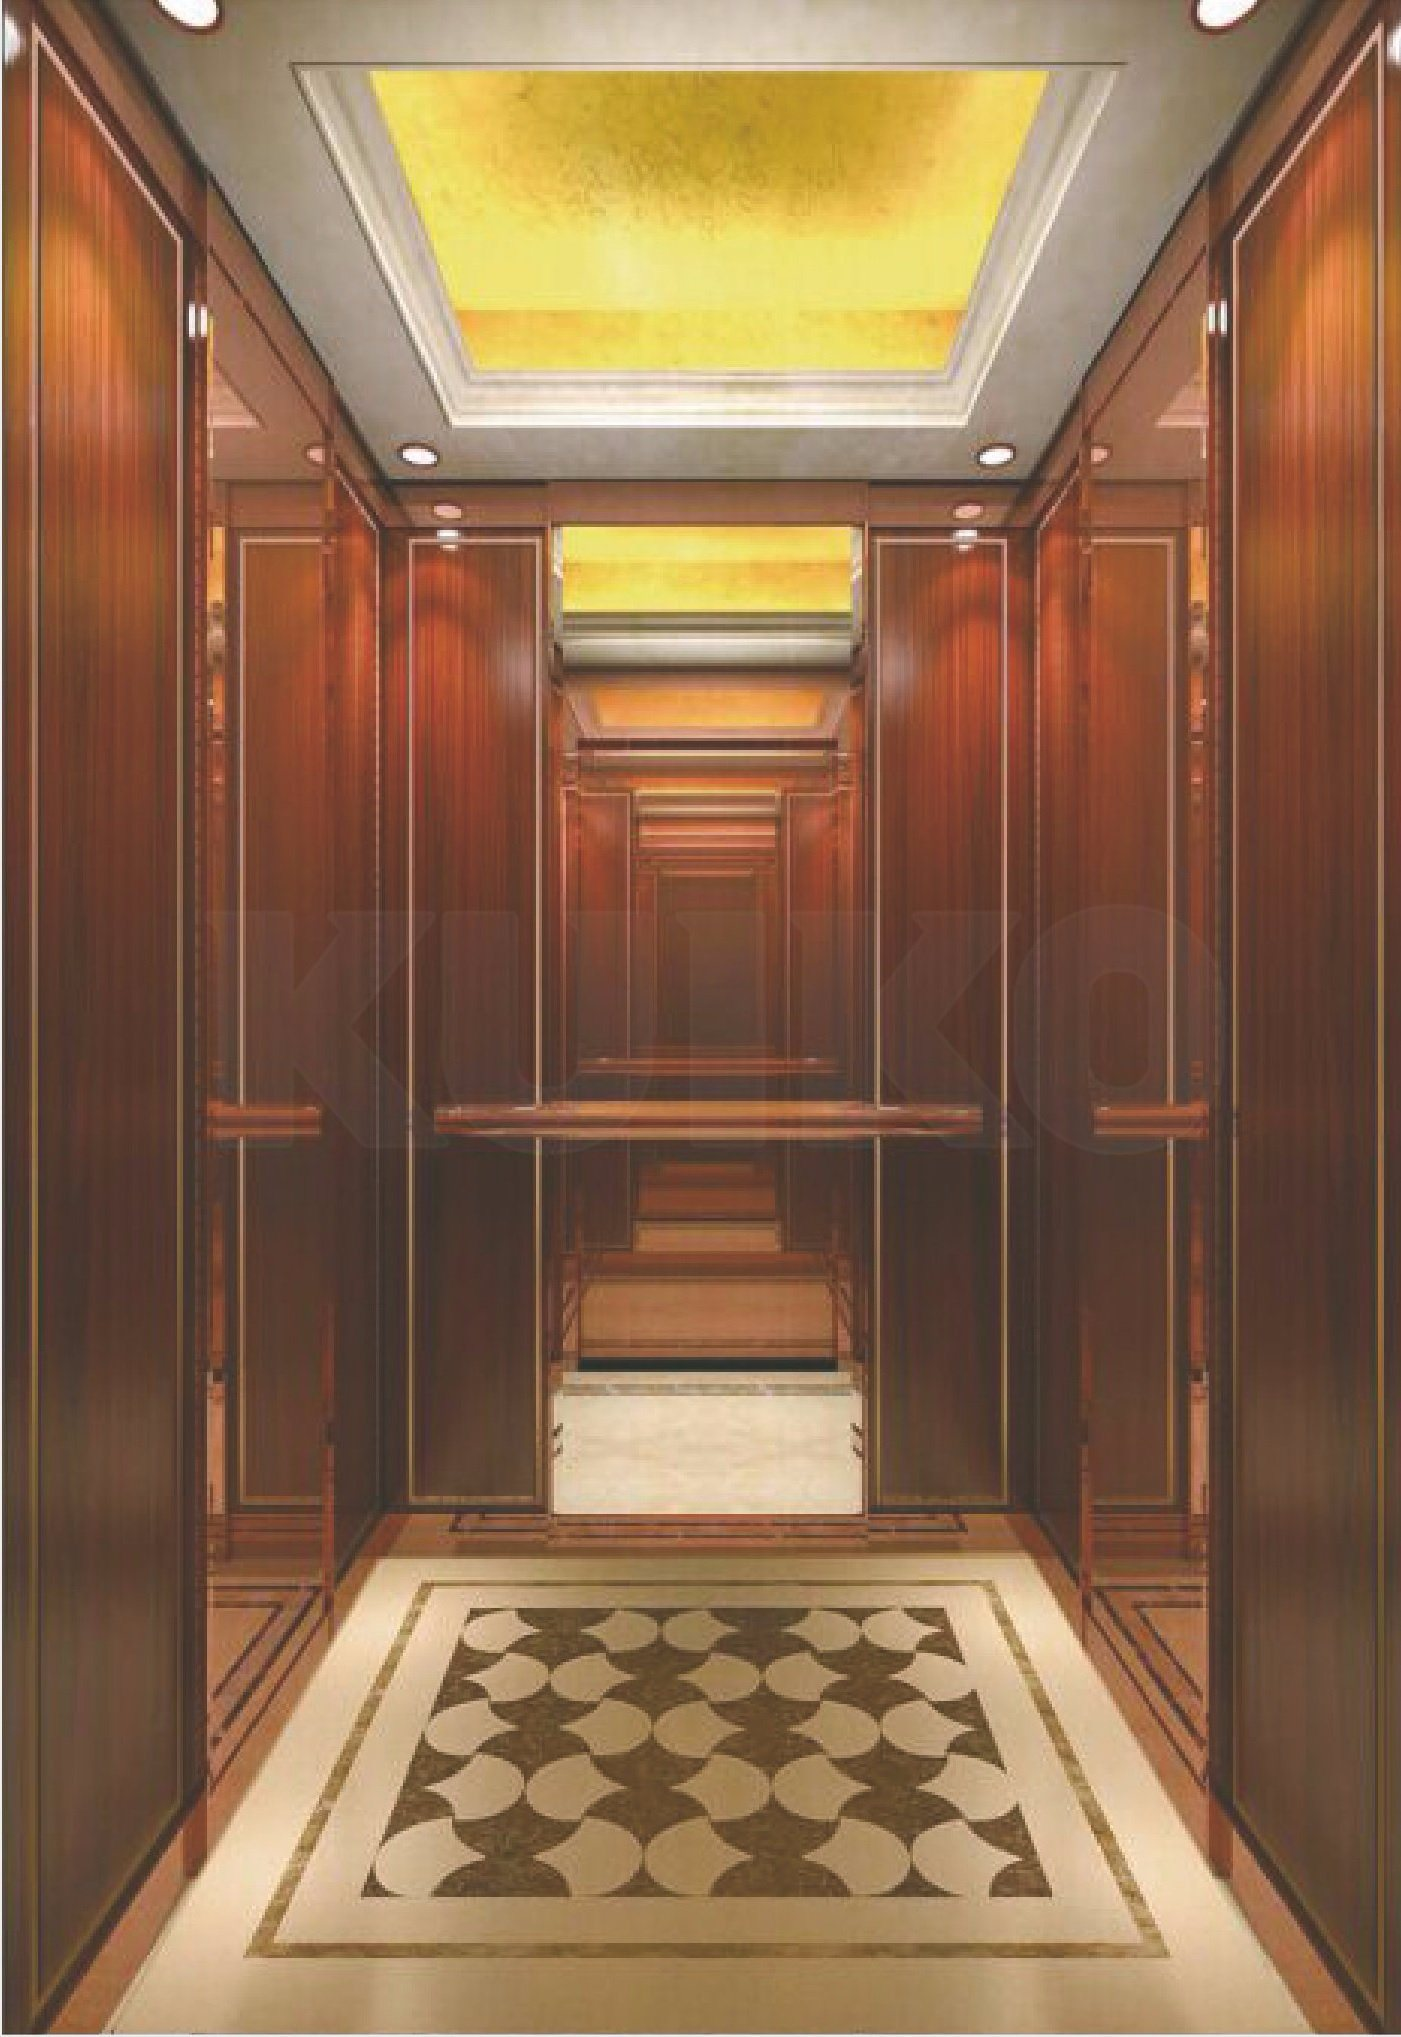 Hotel Car Elevator for Passenger